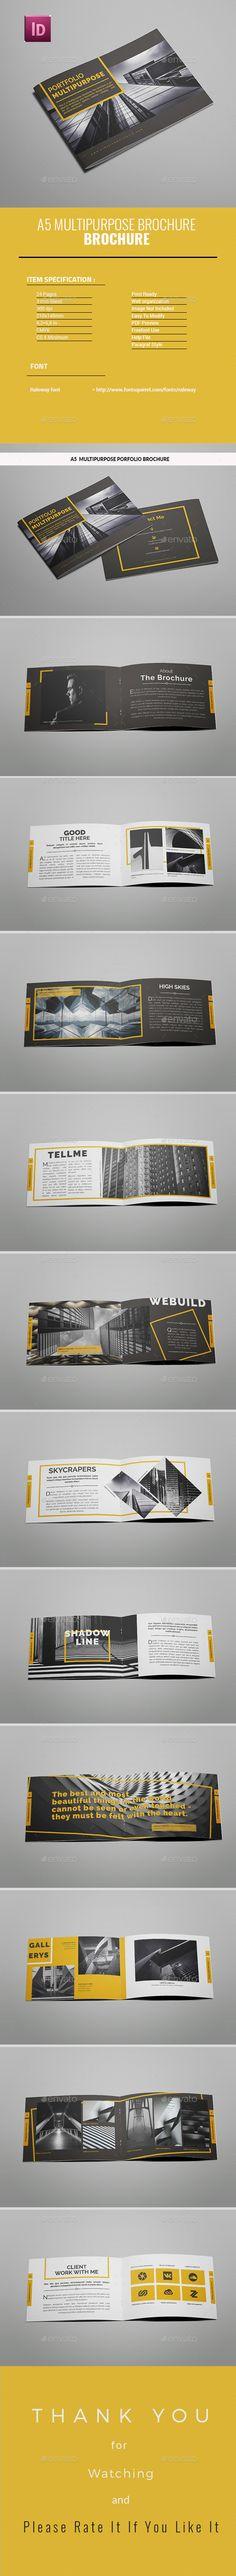 A5 Multipurpose Portfolio Brochure